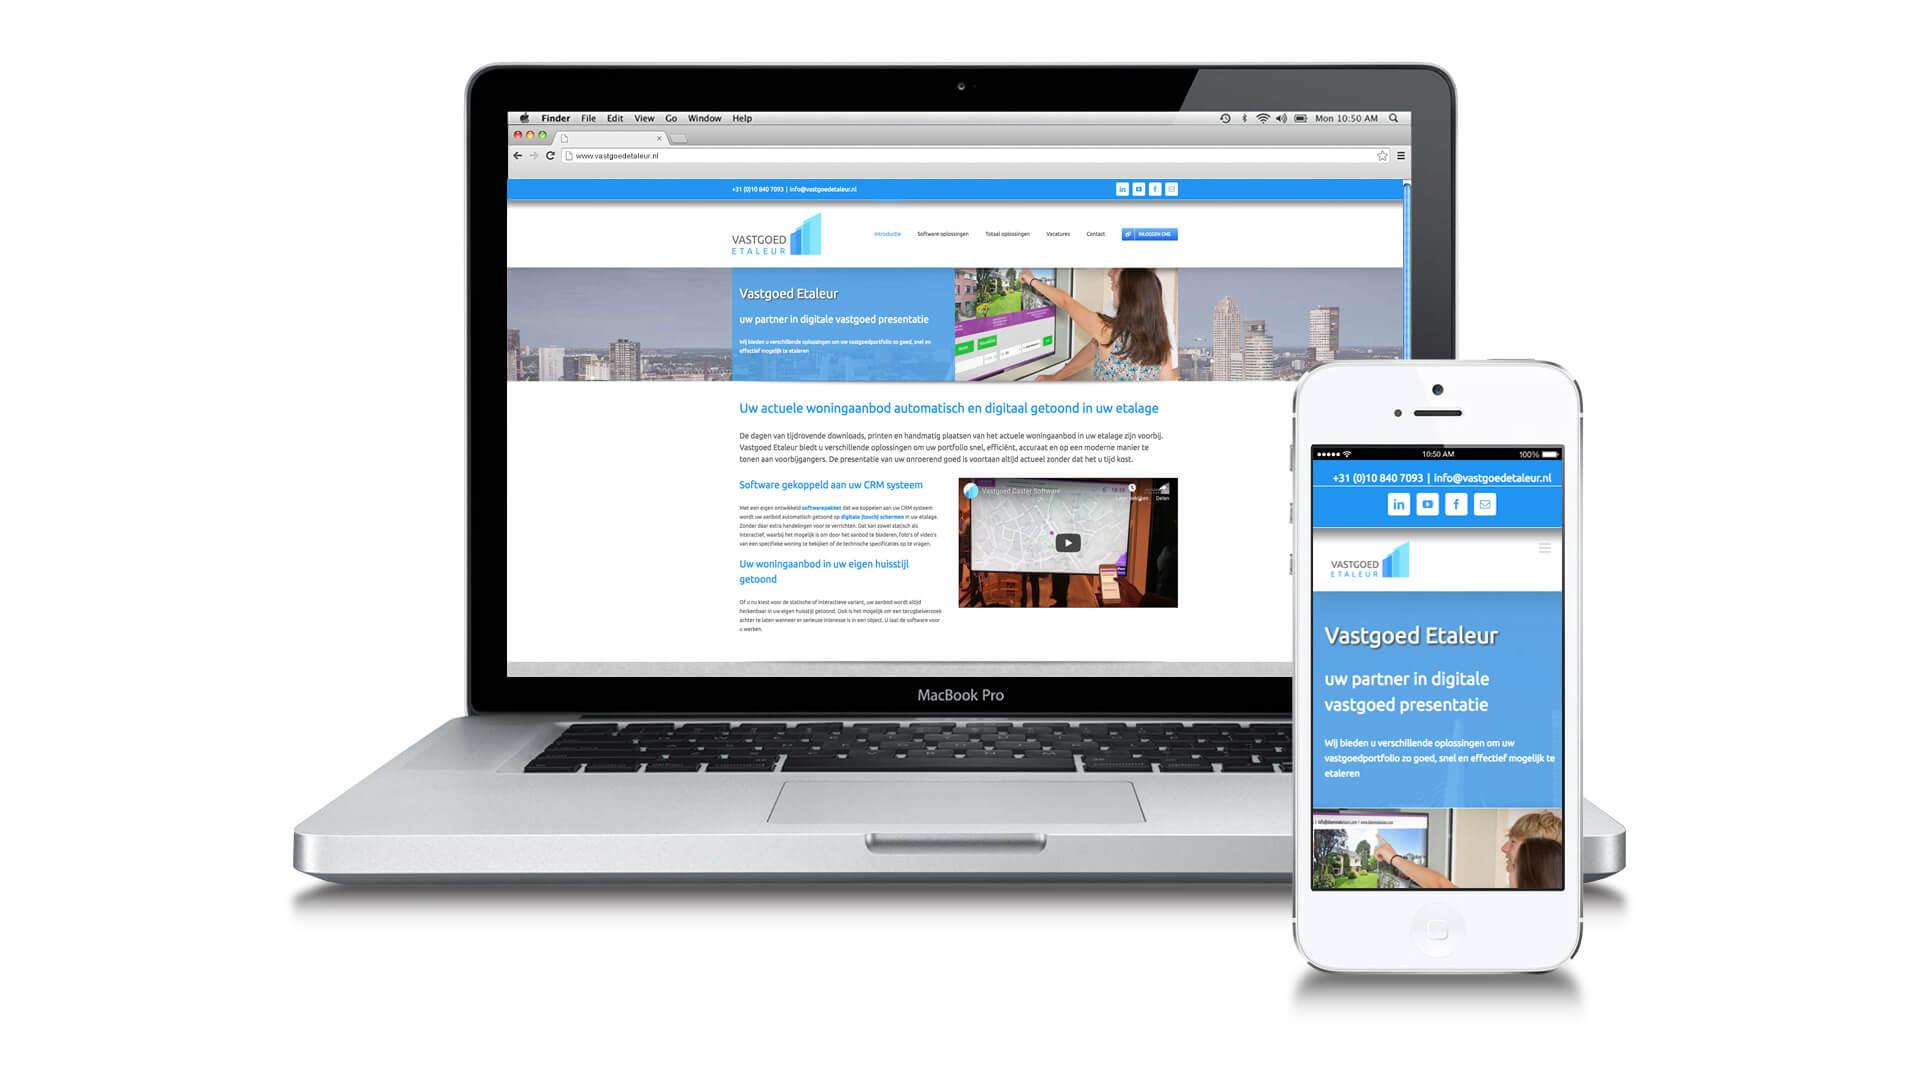 Vastgoed Etaleur corporate website